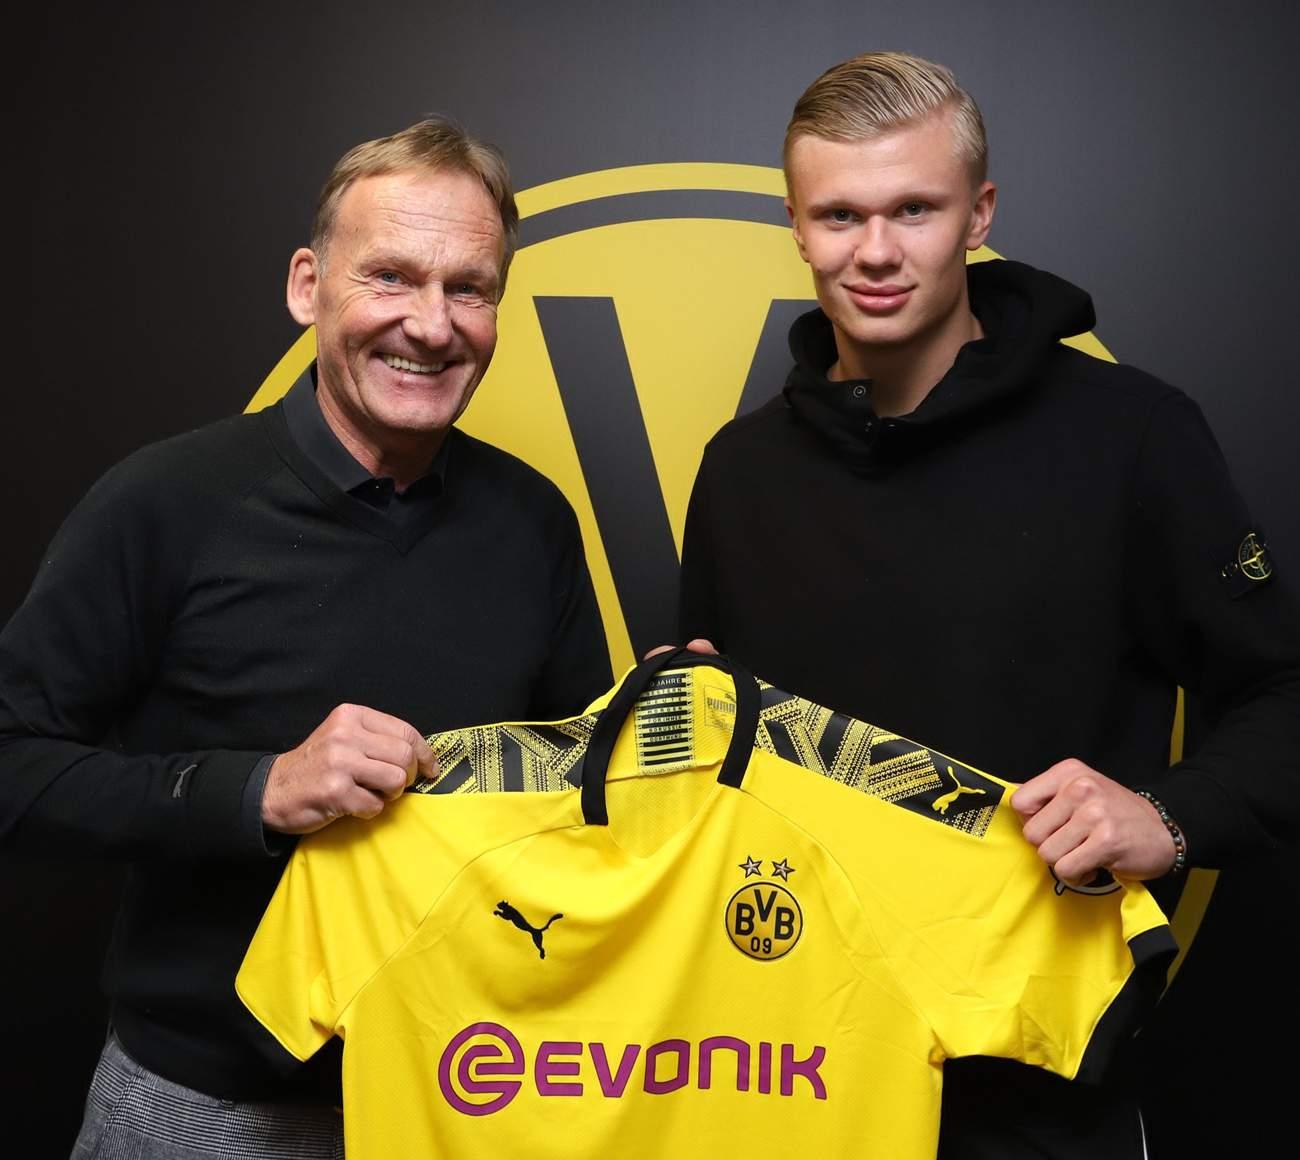 Эрлинг Холанд подписал контракт с «Боруссией» до 2024 года.